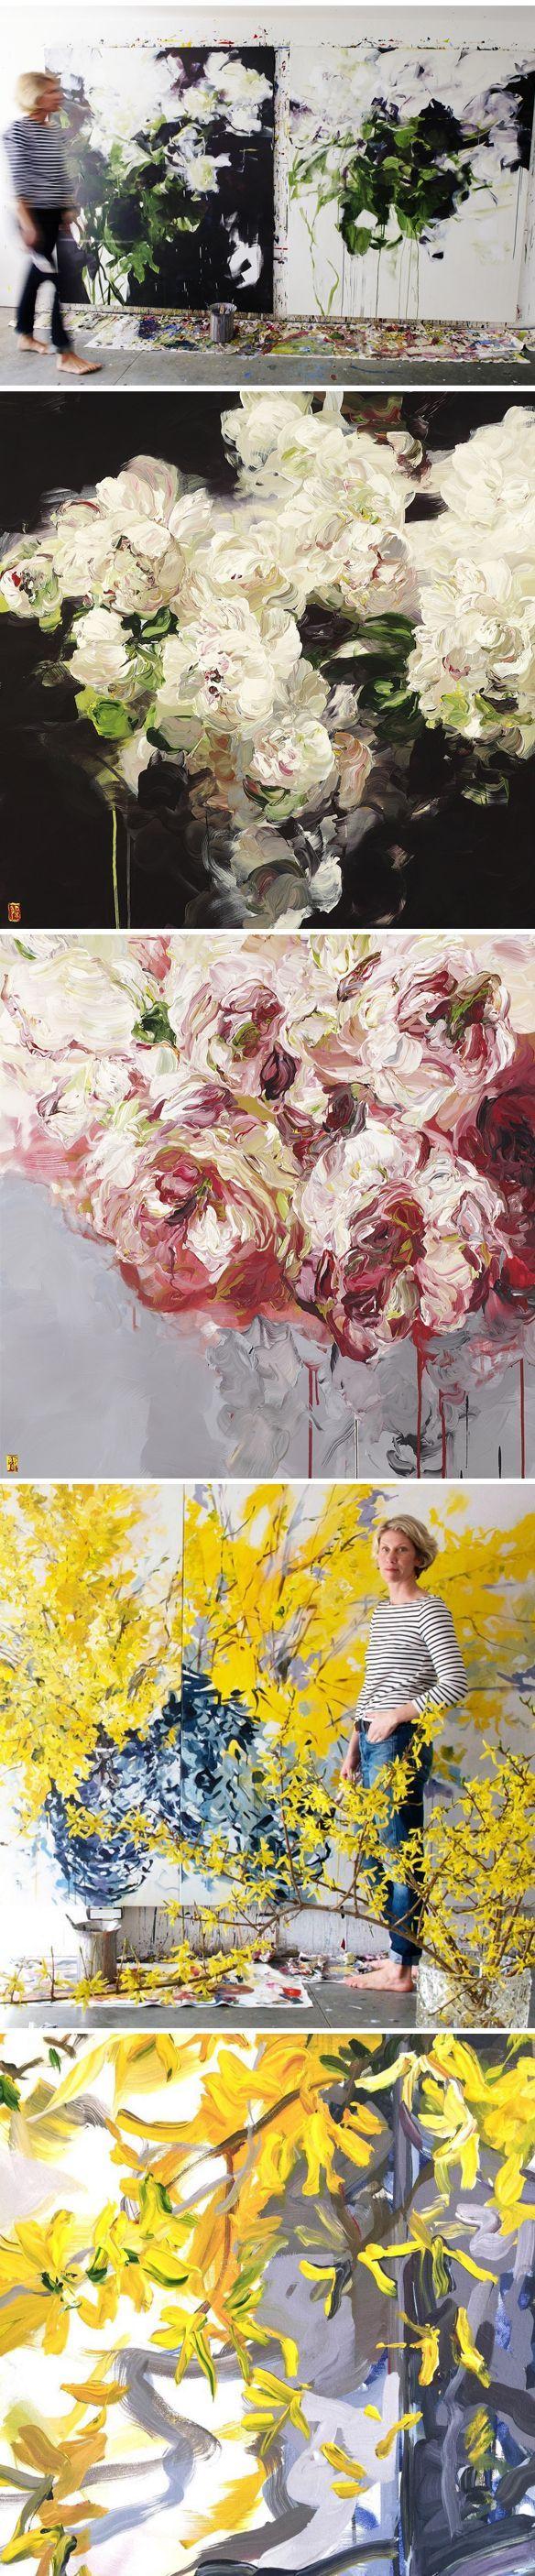 Home mehndi design 2018 einfach und leicht  best malen images on pinterest  landscape paintings abstract